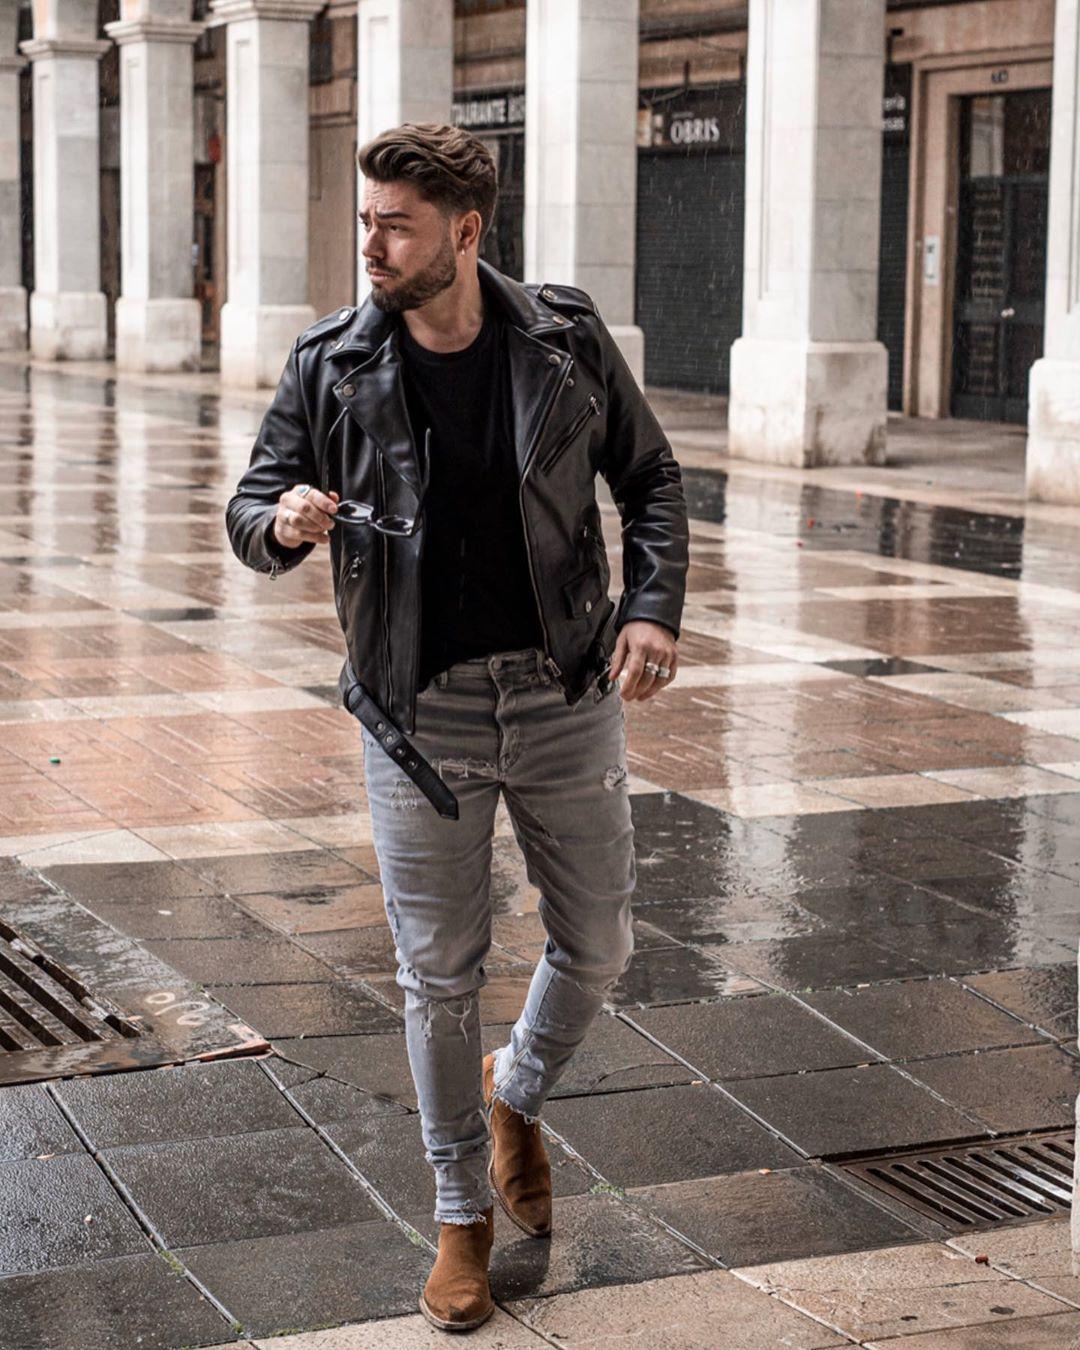 Leather jacket in rain